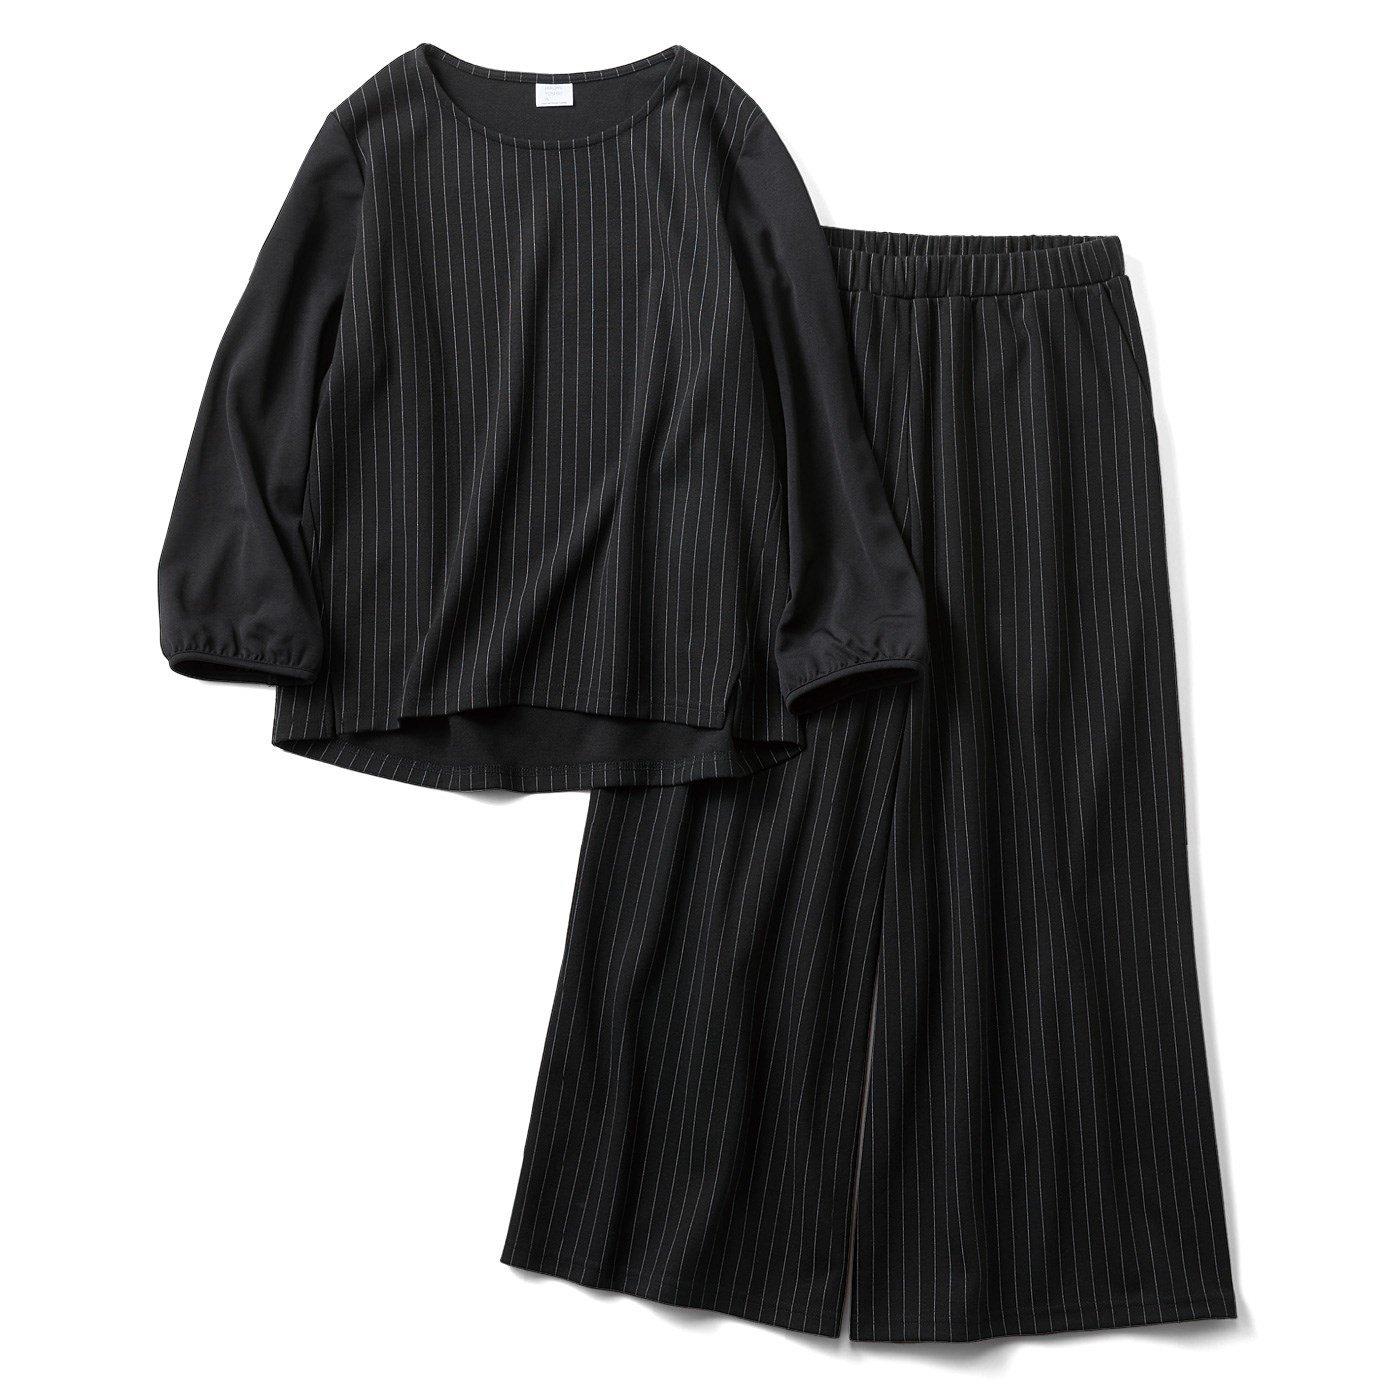 HIROMI YOSHIDA. ピンストライプのセットアップ〈ブラック〉